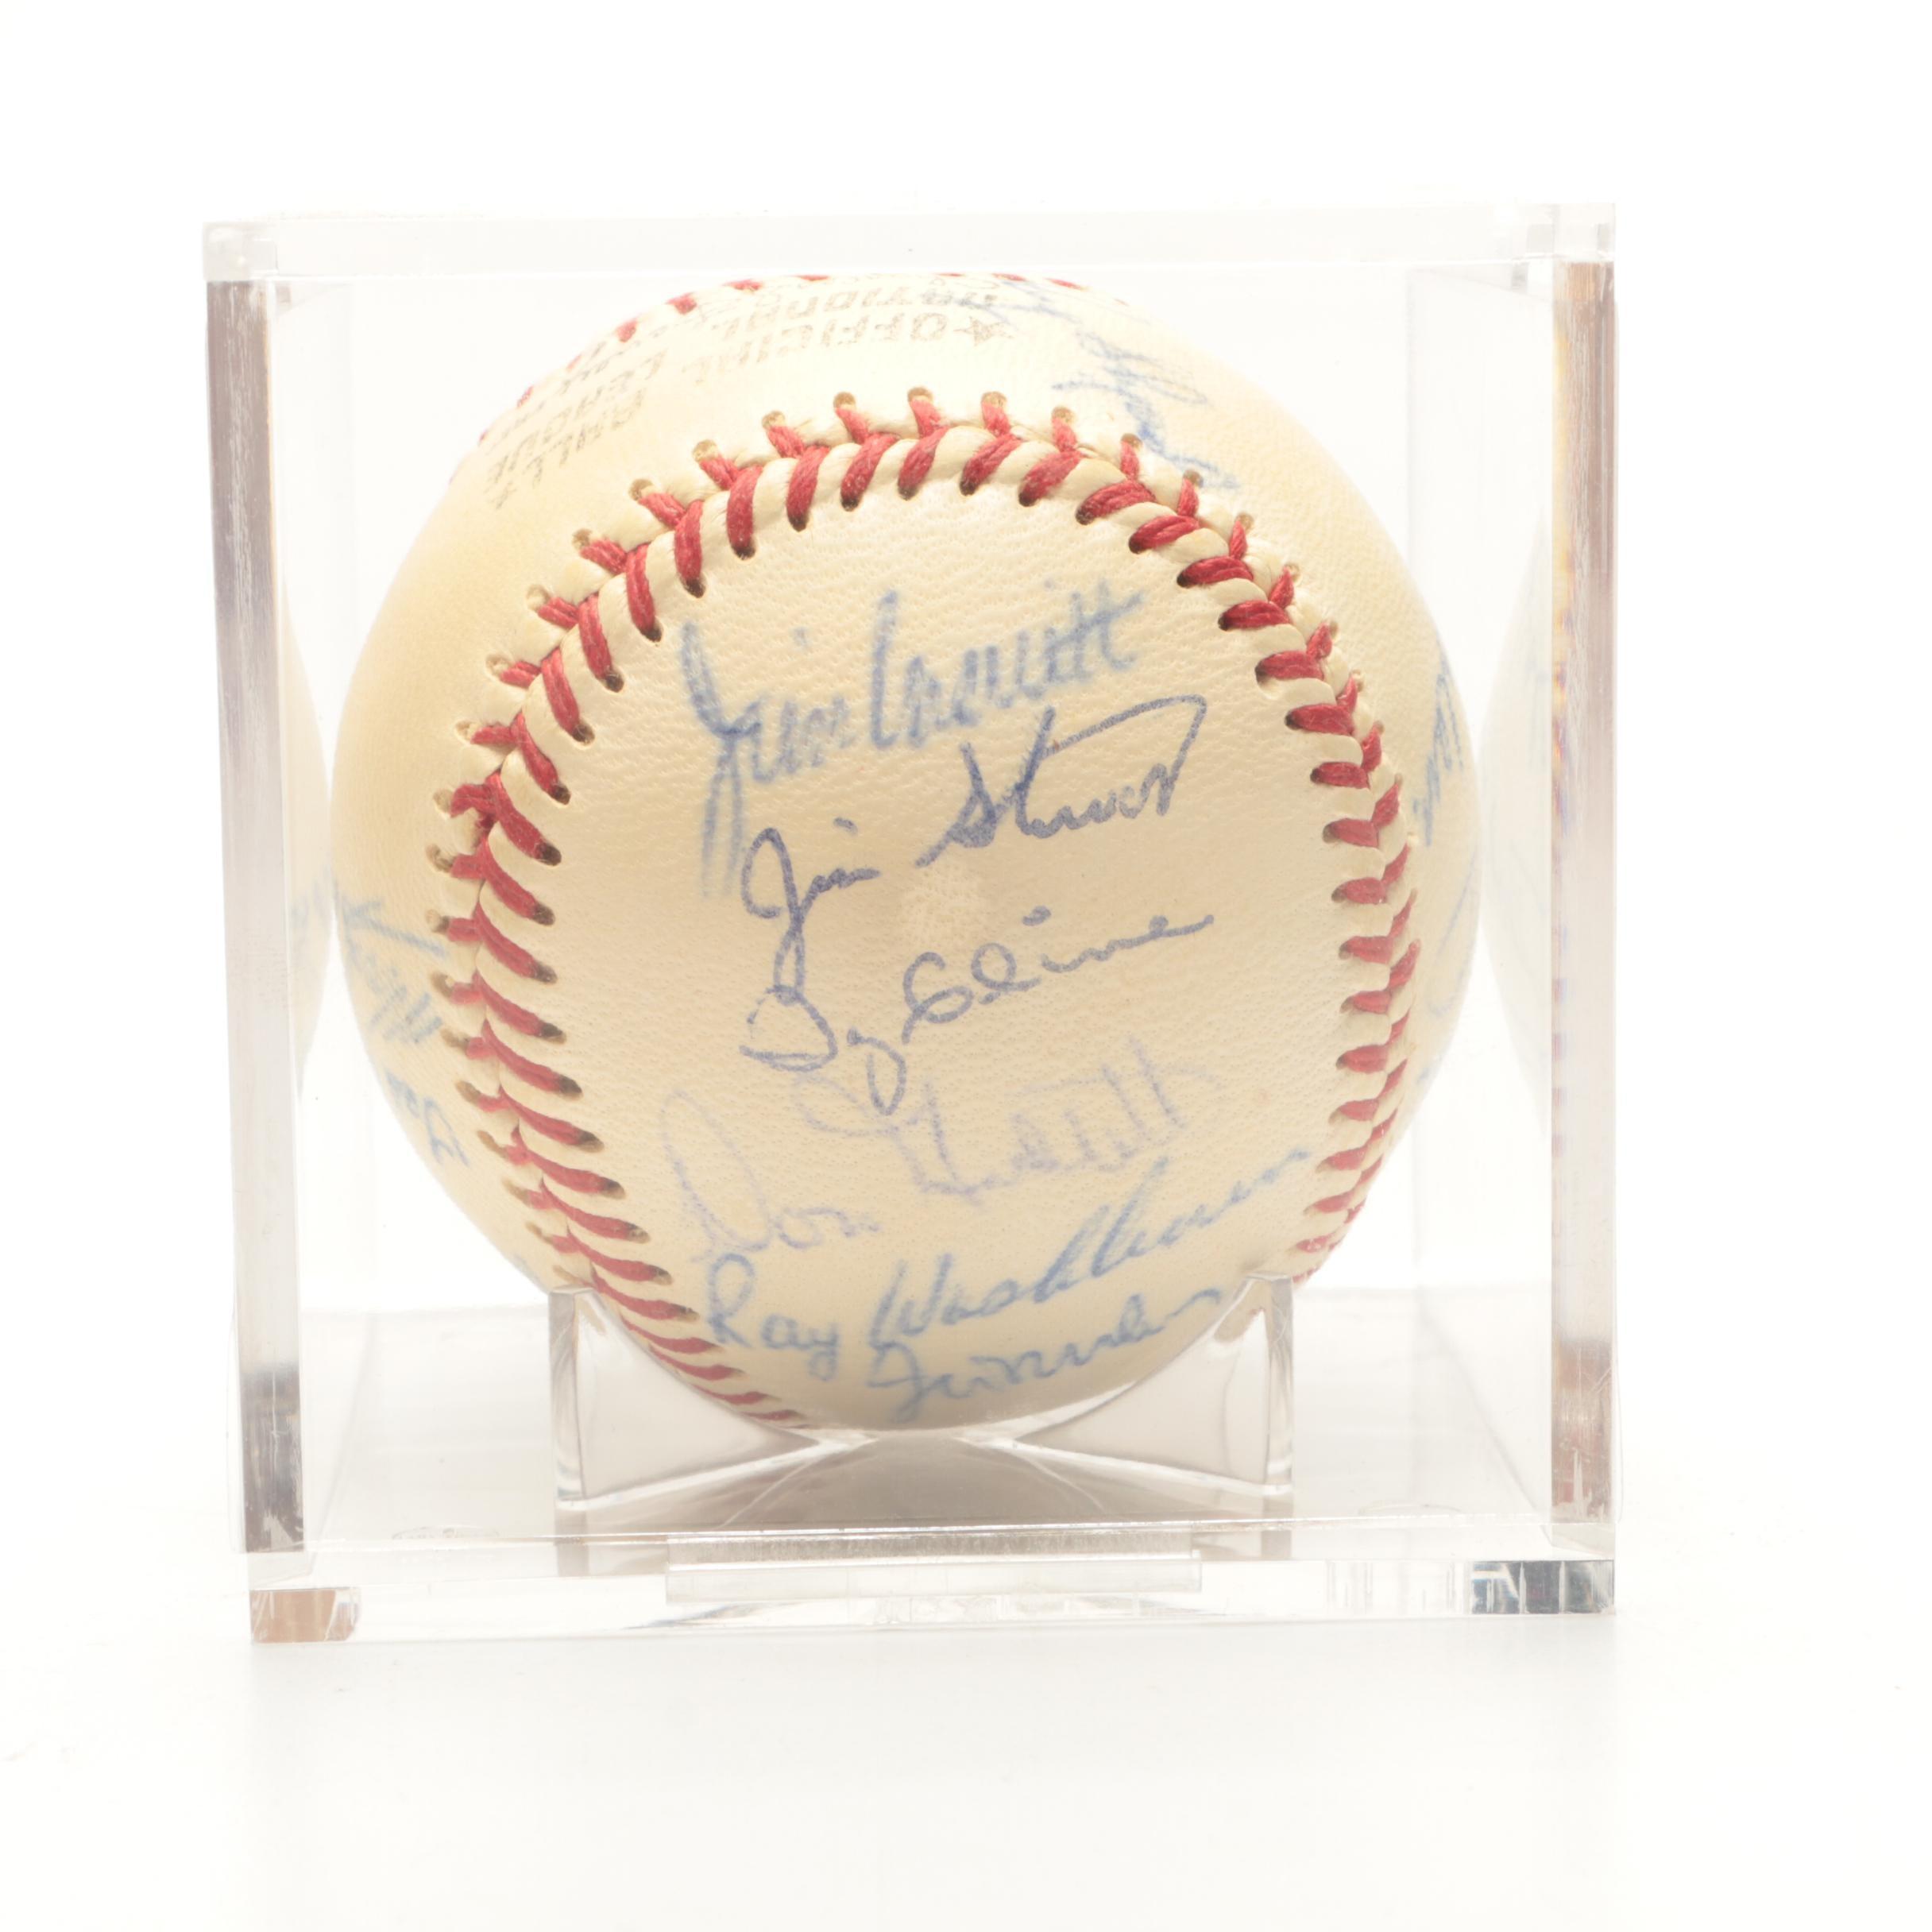 1970 Cincinnati Reds Signed National League Baseball